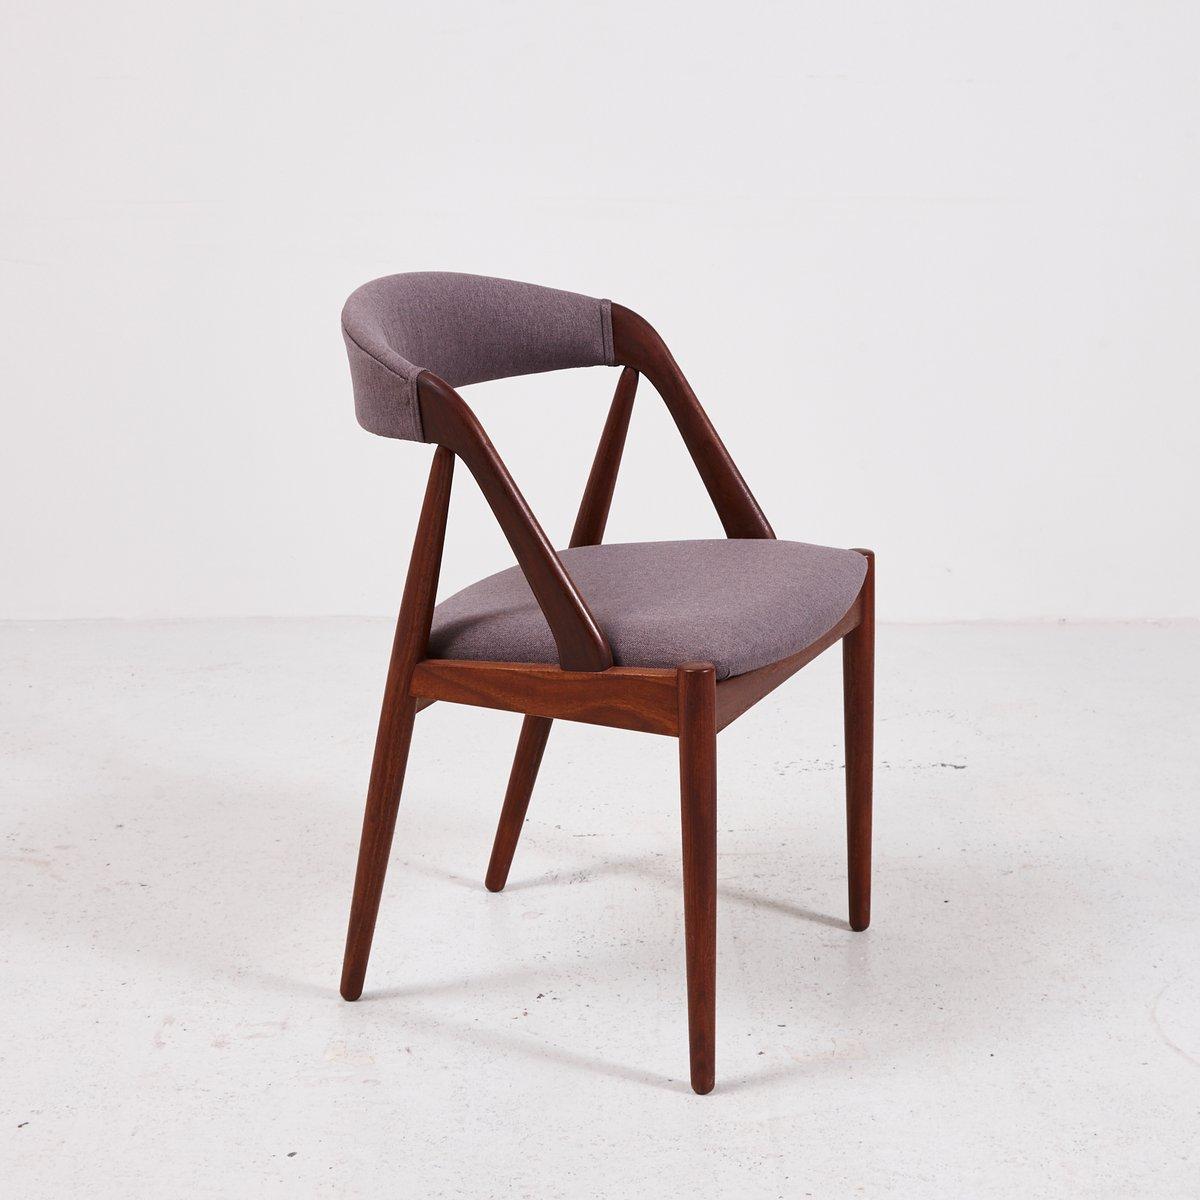 Mid century model 31 teak chair by kai kristiansen for schou andersen for sale at pamono - Kai kristiansen chair ...